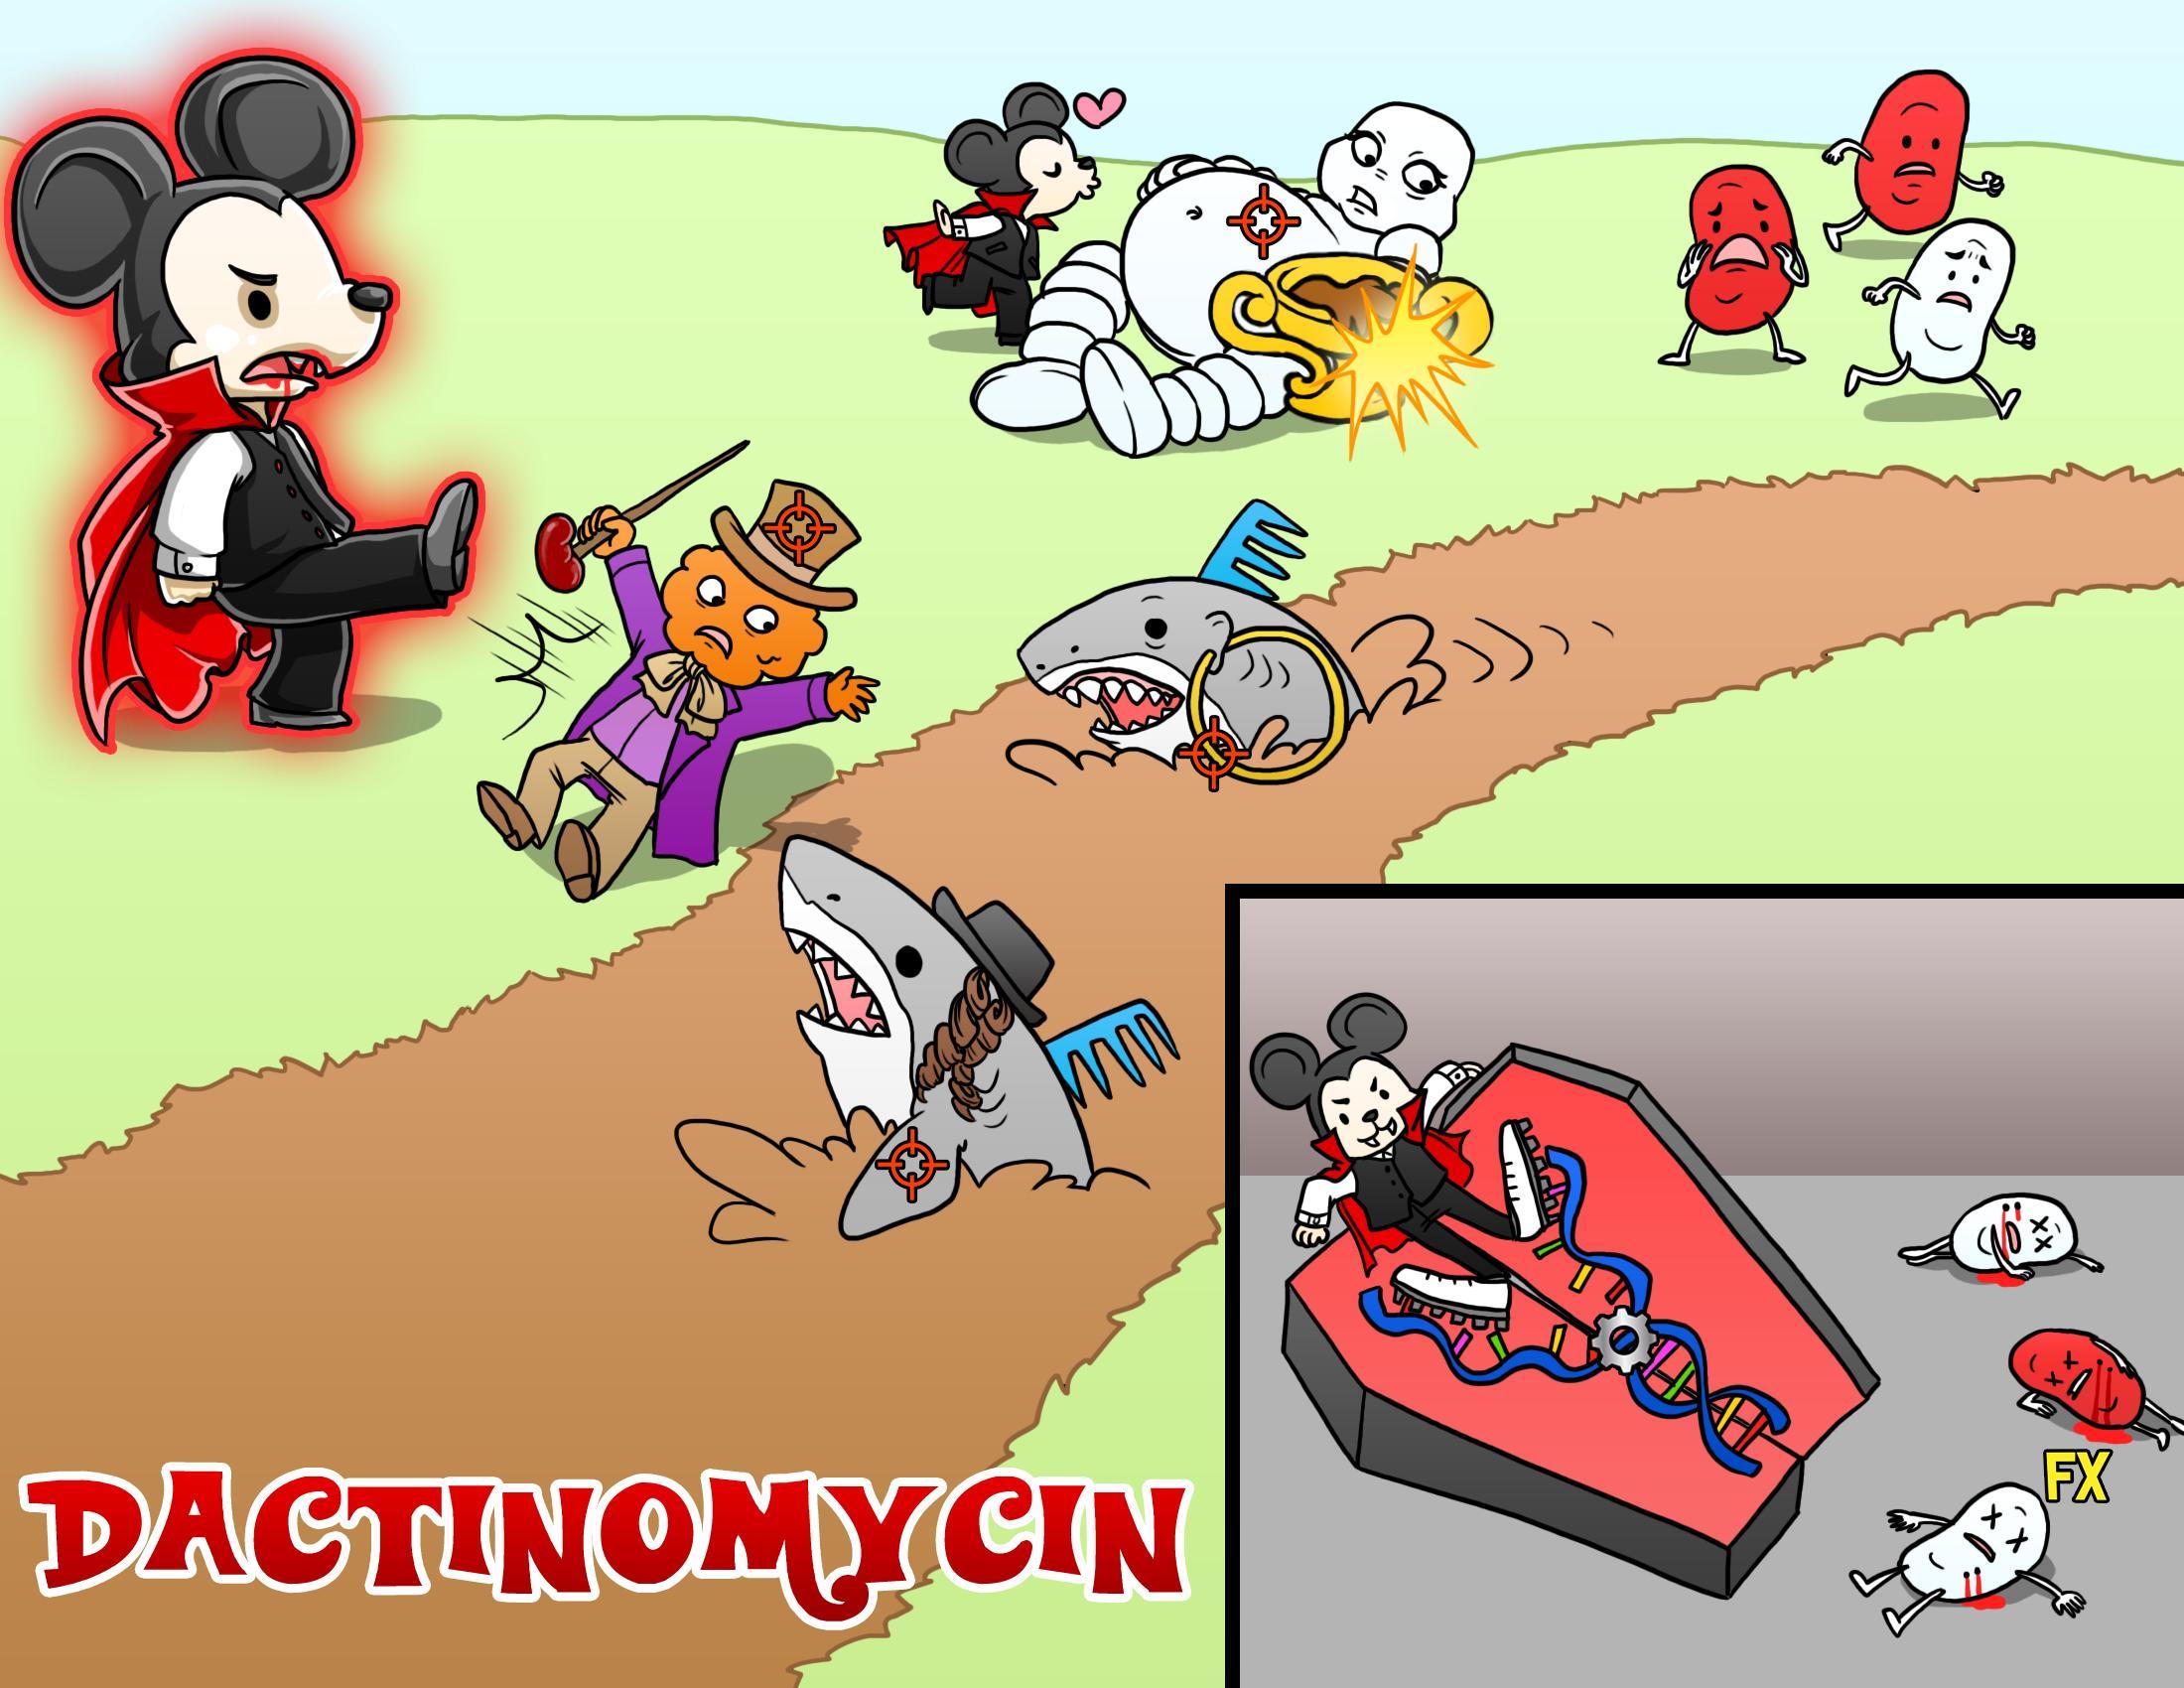 Dactinomycin (Actinomycin D)